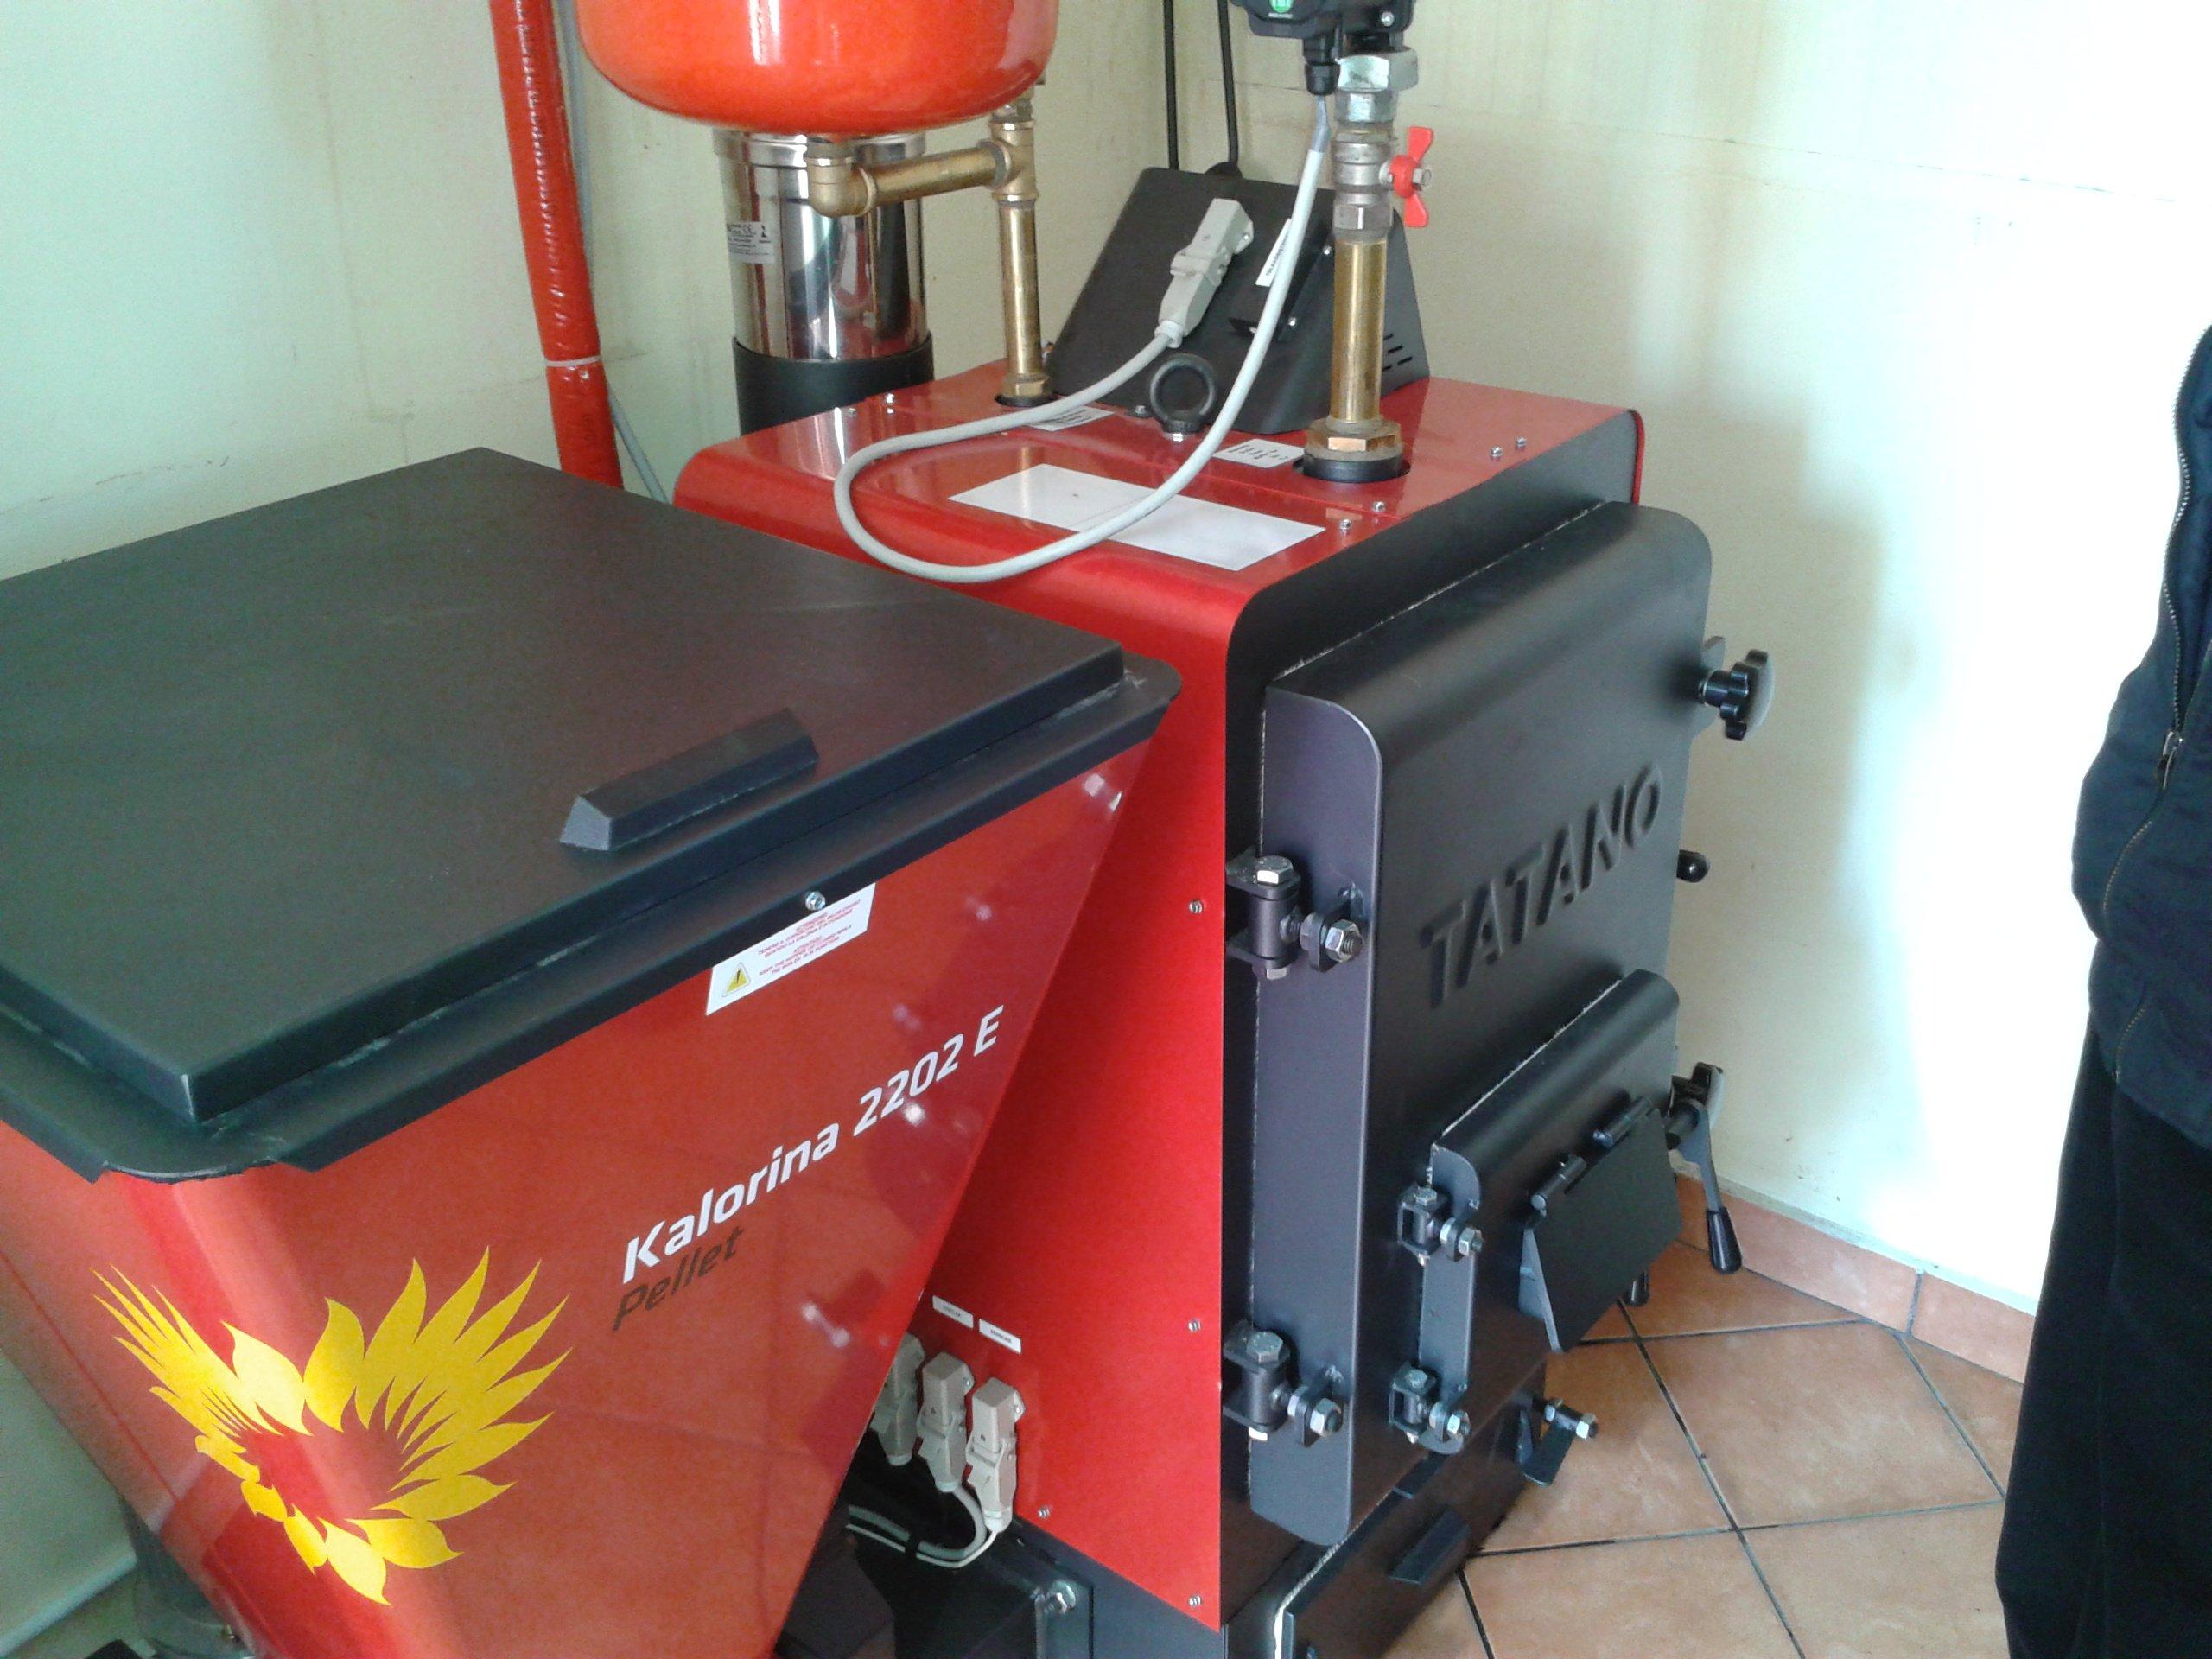 Un impianto di riscaldamento a pellet